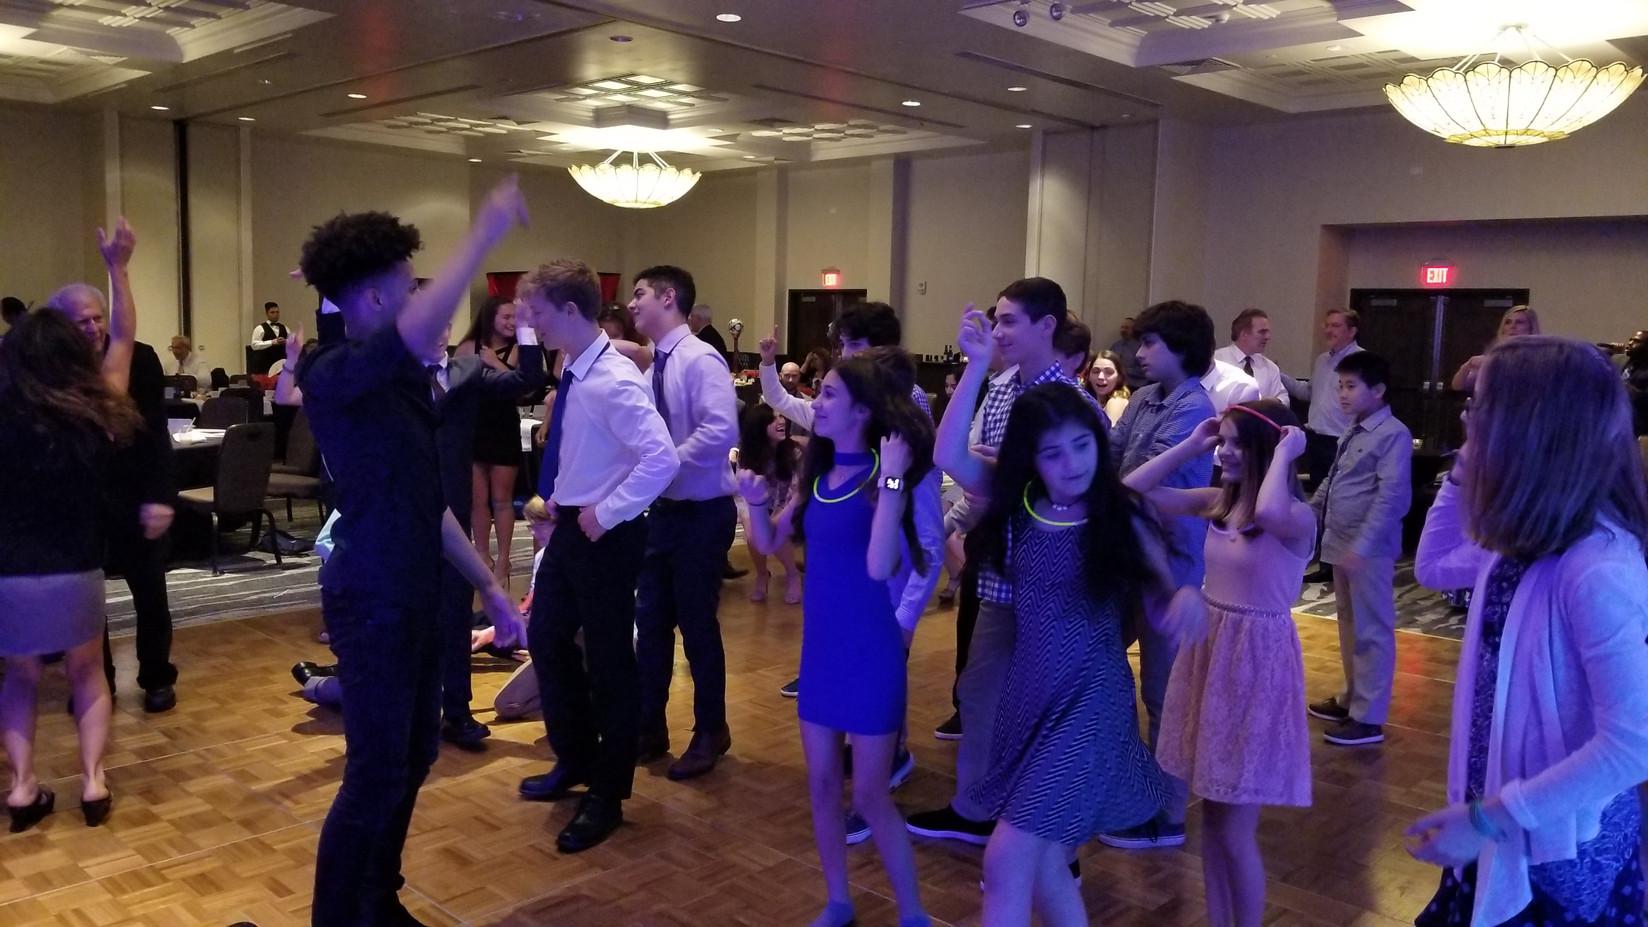 Teens-Group-Dance-Headed-By-MME-Dancer.jpg